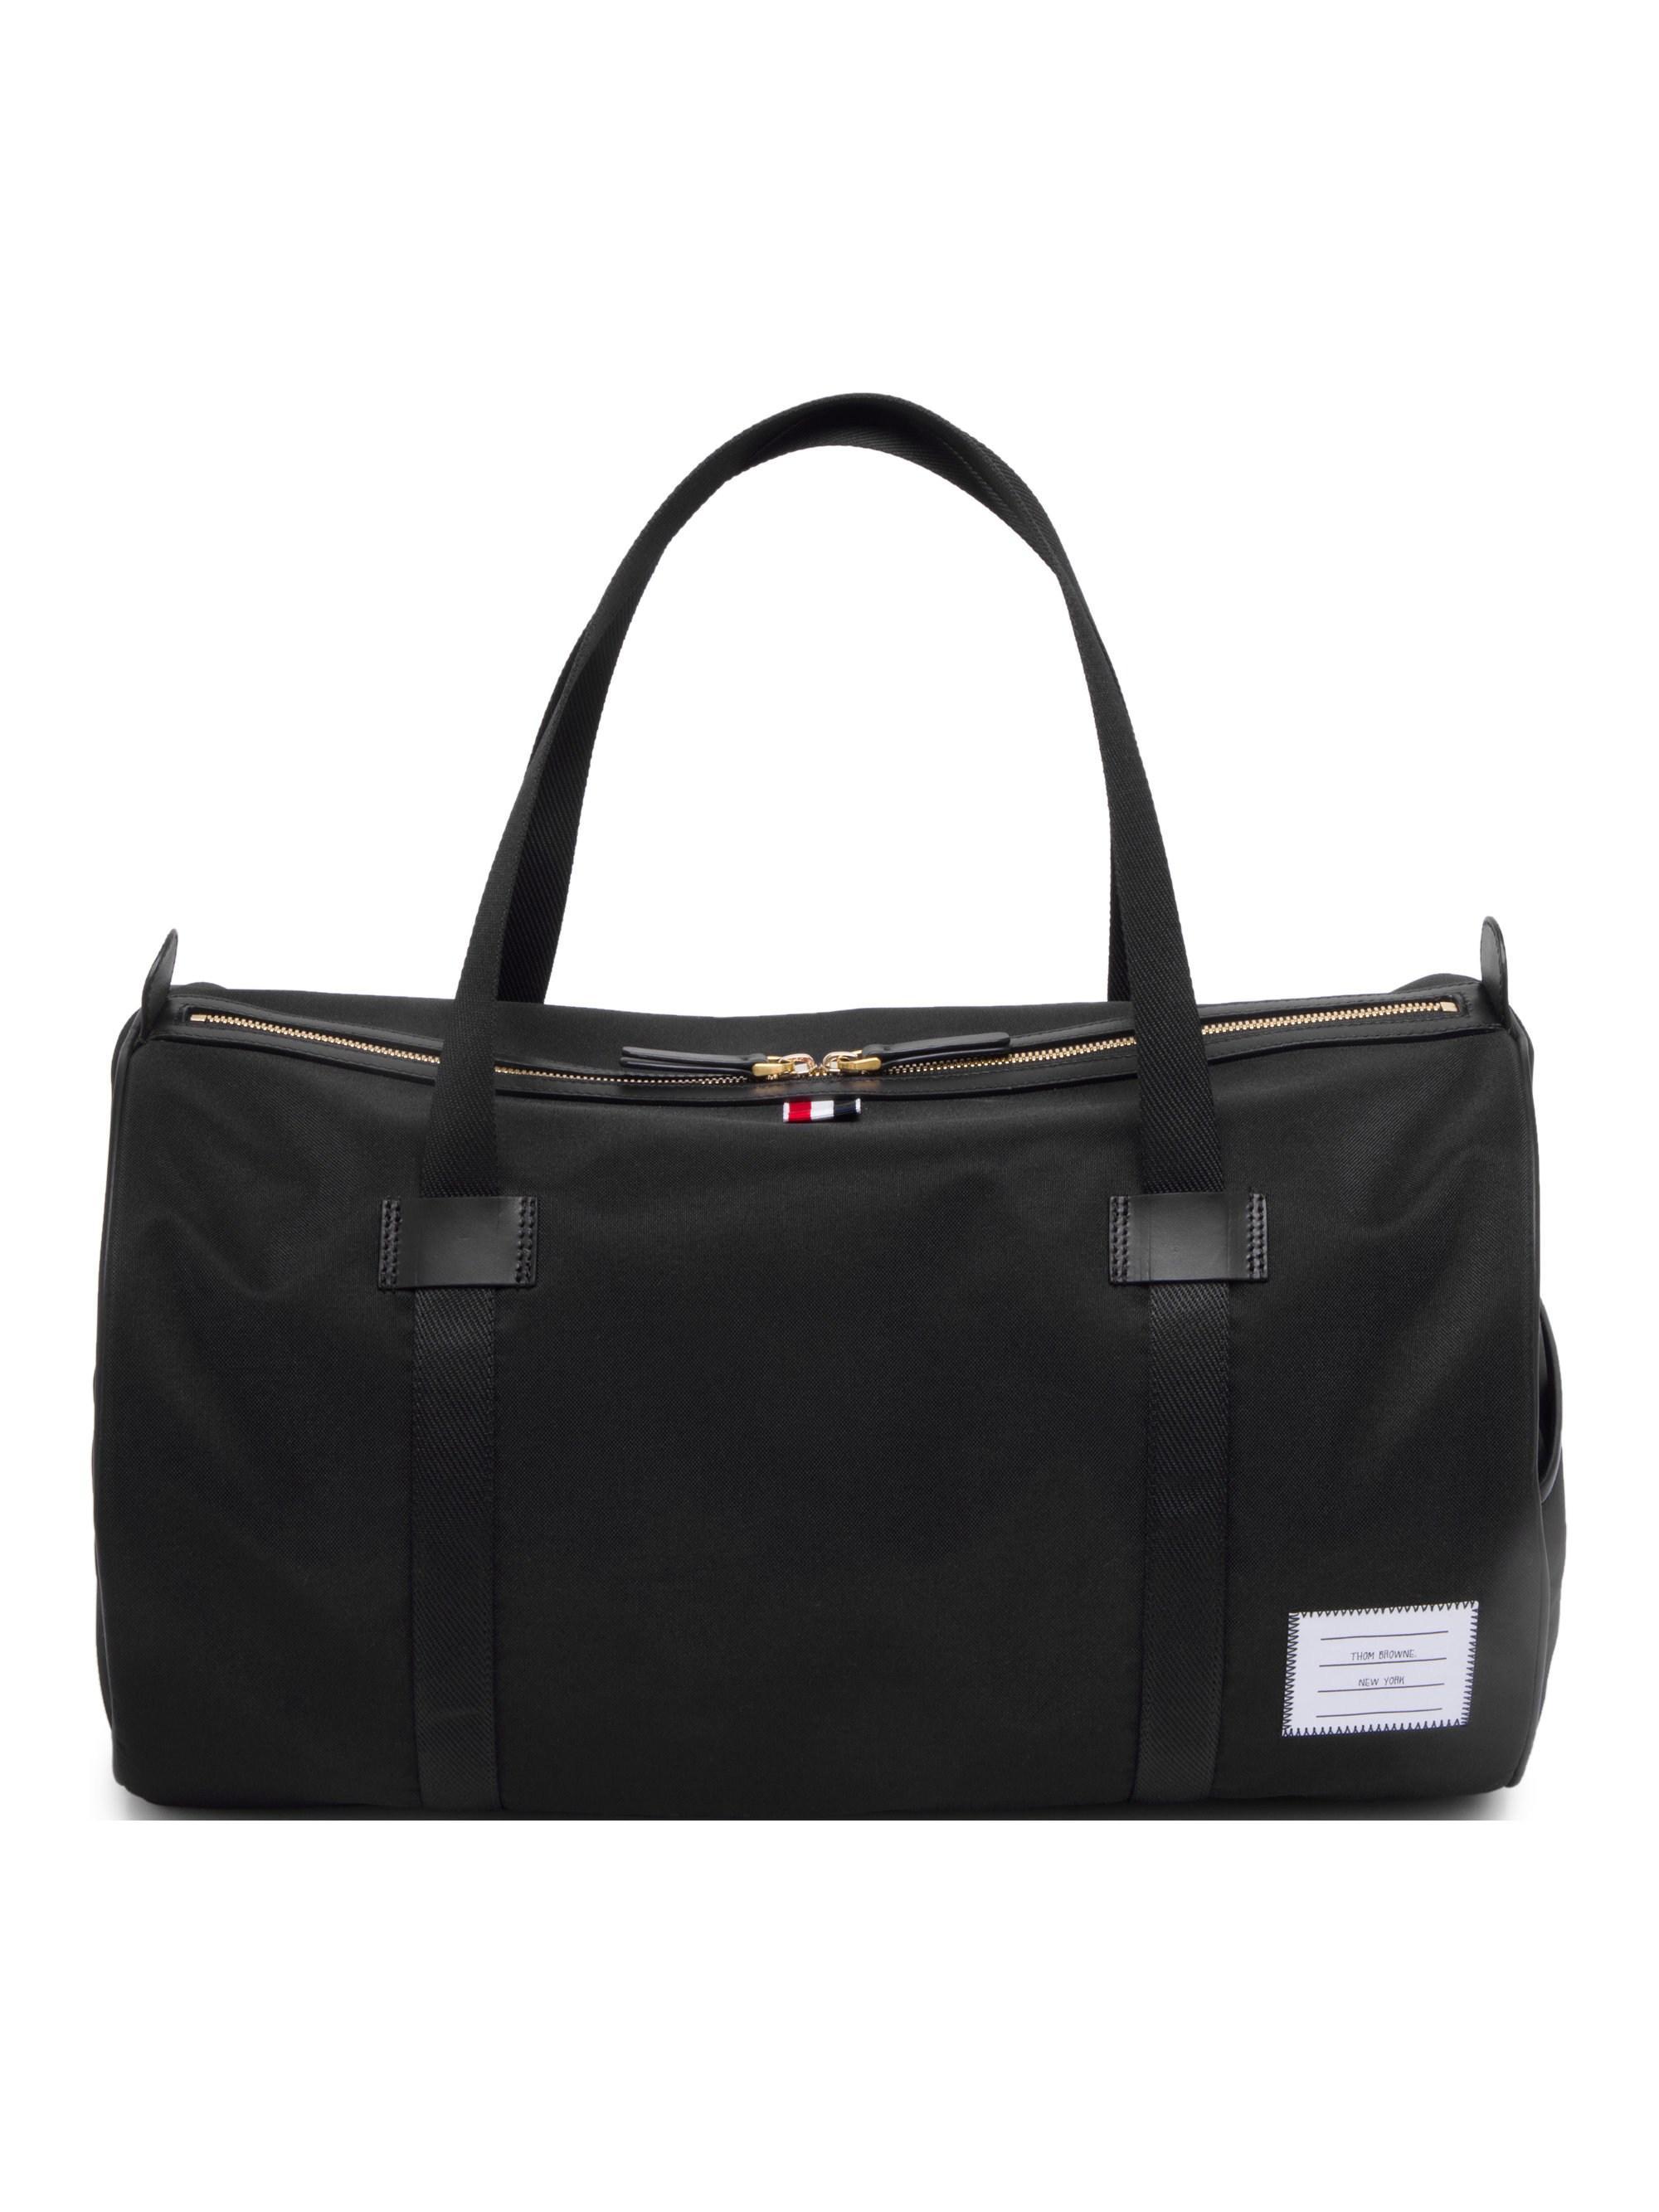 2aefa9878e Lyst - Thom Browne Men s Leather Duffel Bag - Black in Black for Men